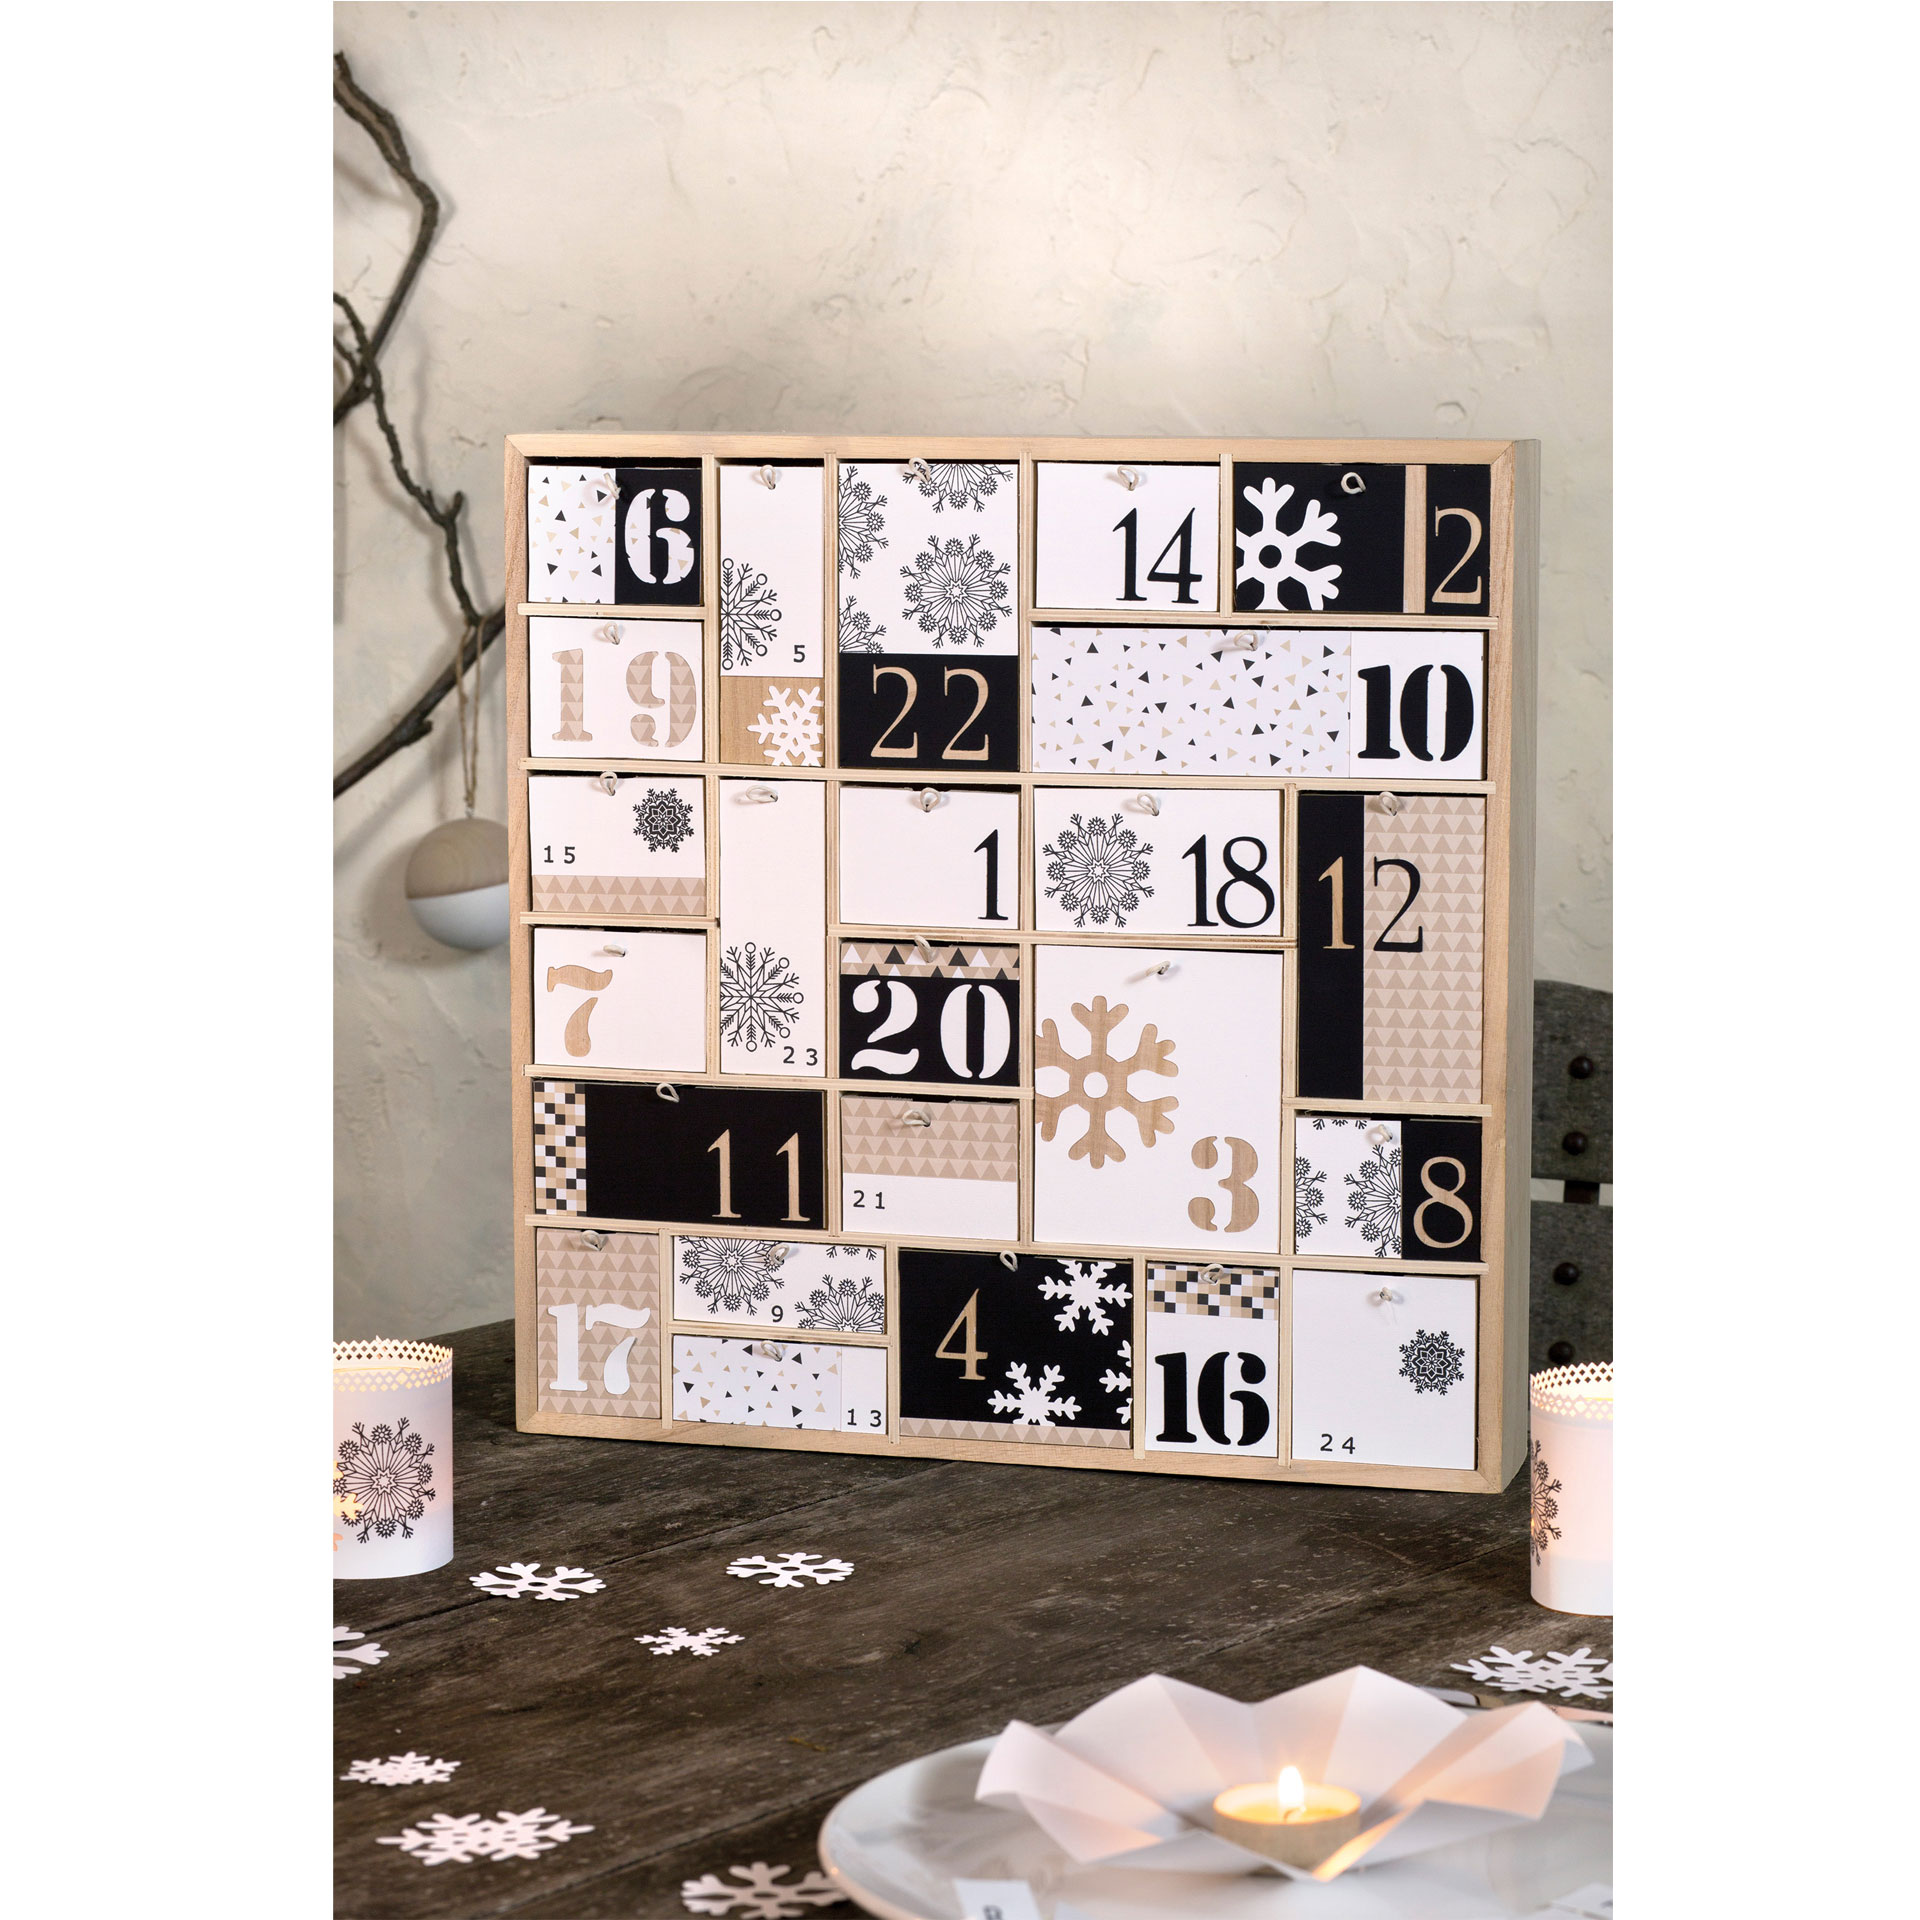 Calendario de adviento 40x40x6,5 cm. Cajones